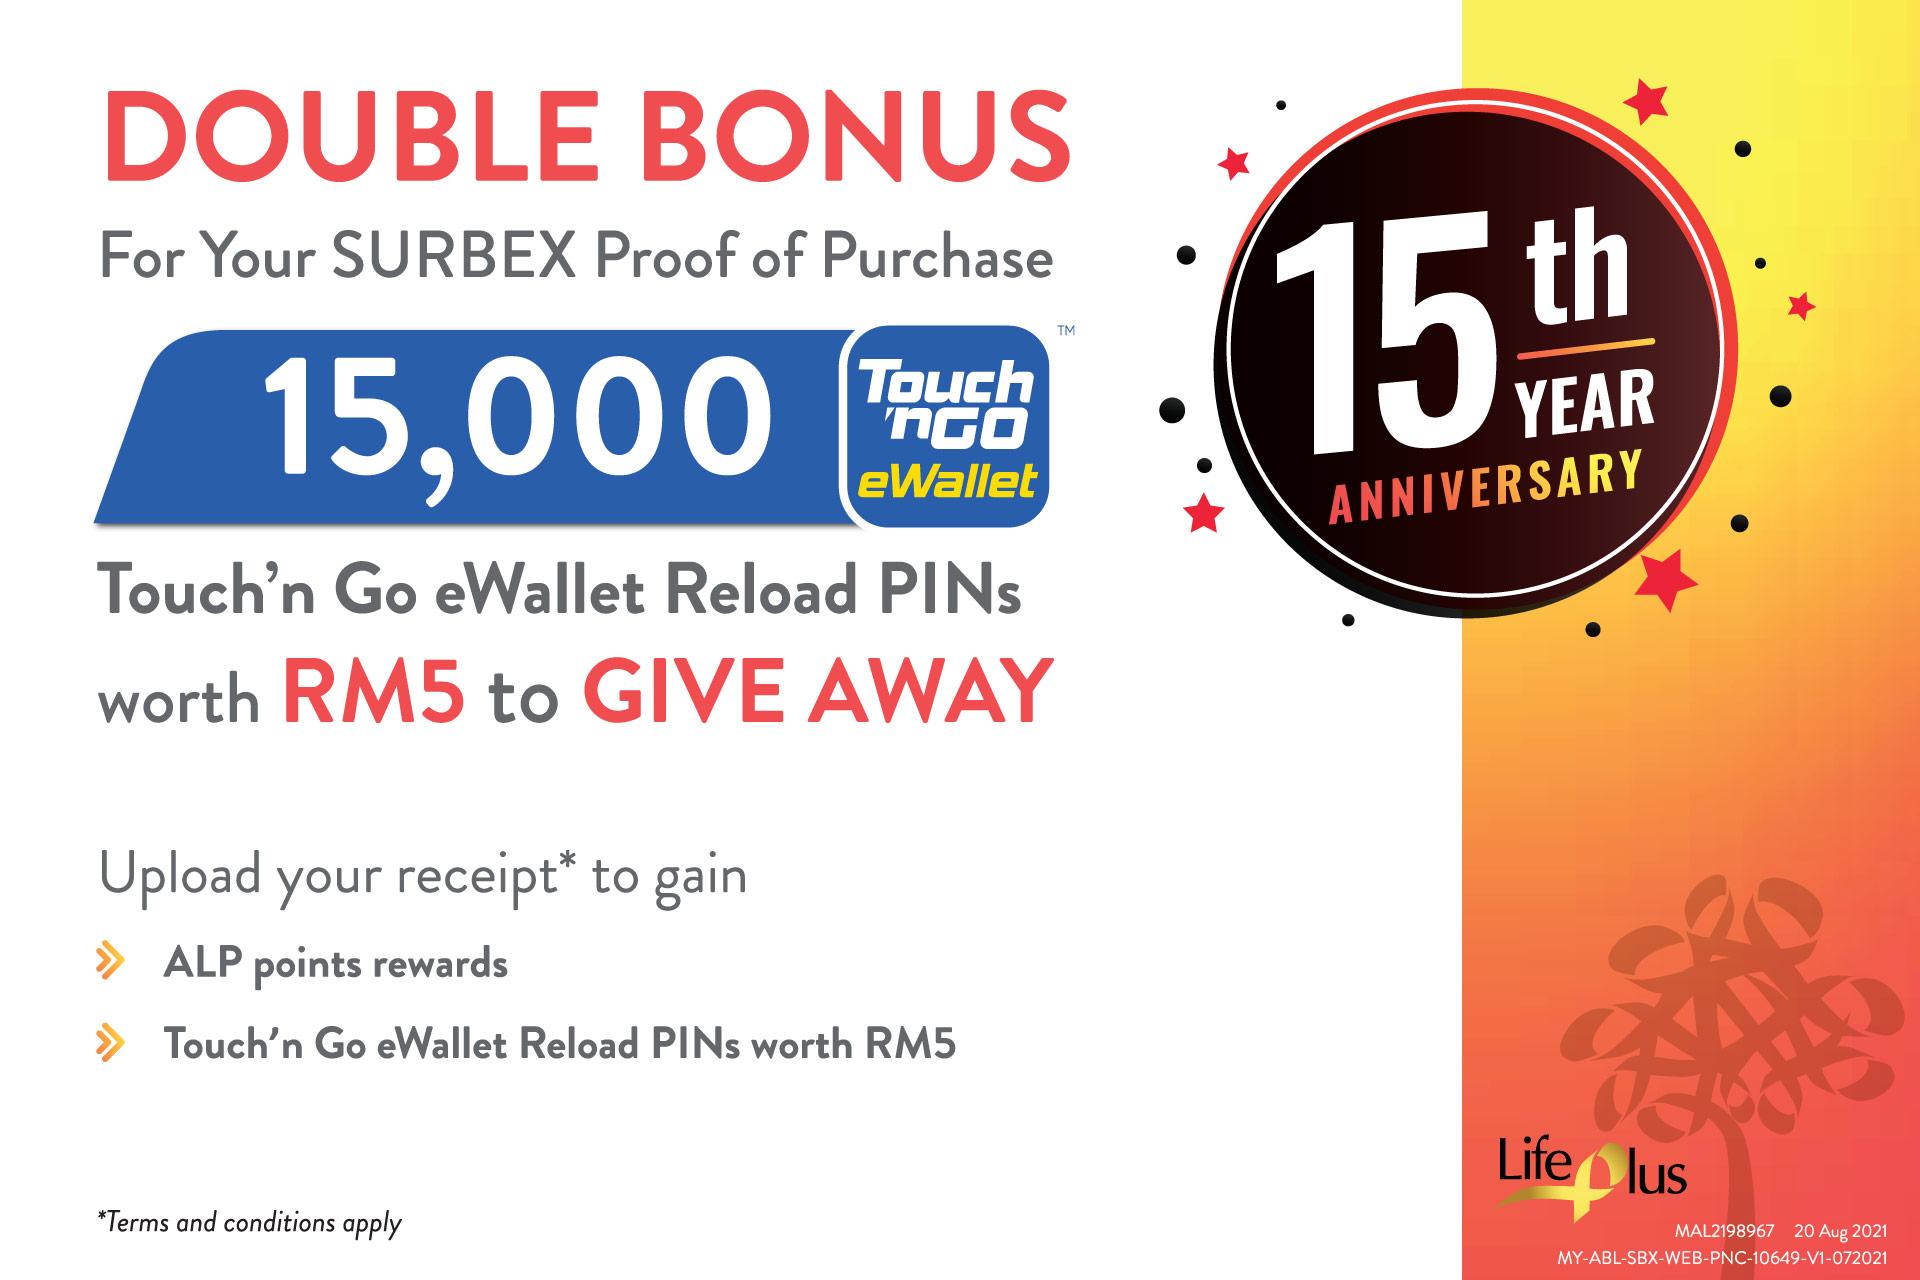 15th Anniversary Double Bonus